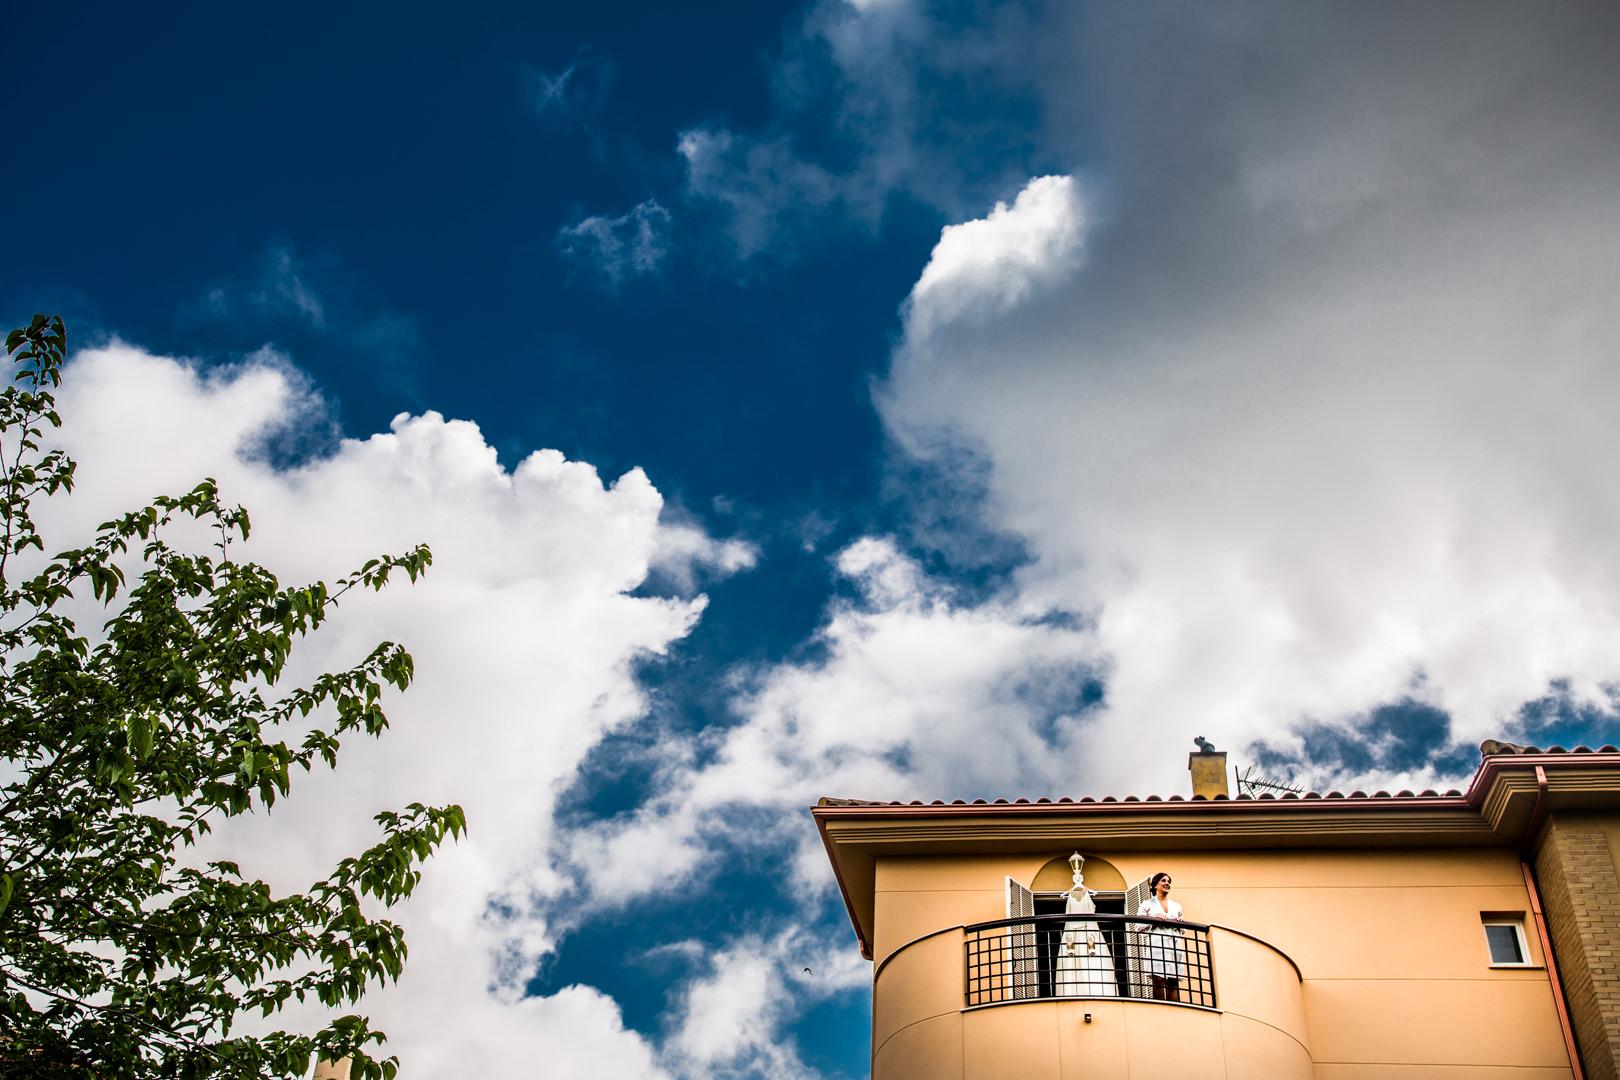 Boda-Catedral-Jaen-Hamburgo-Maria-David-engagement-Rafael-Torres-fotografo-bodas-sevilla-madrid-barcelona-wedding-photographer--12.jpg